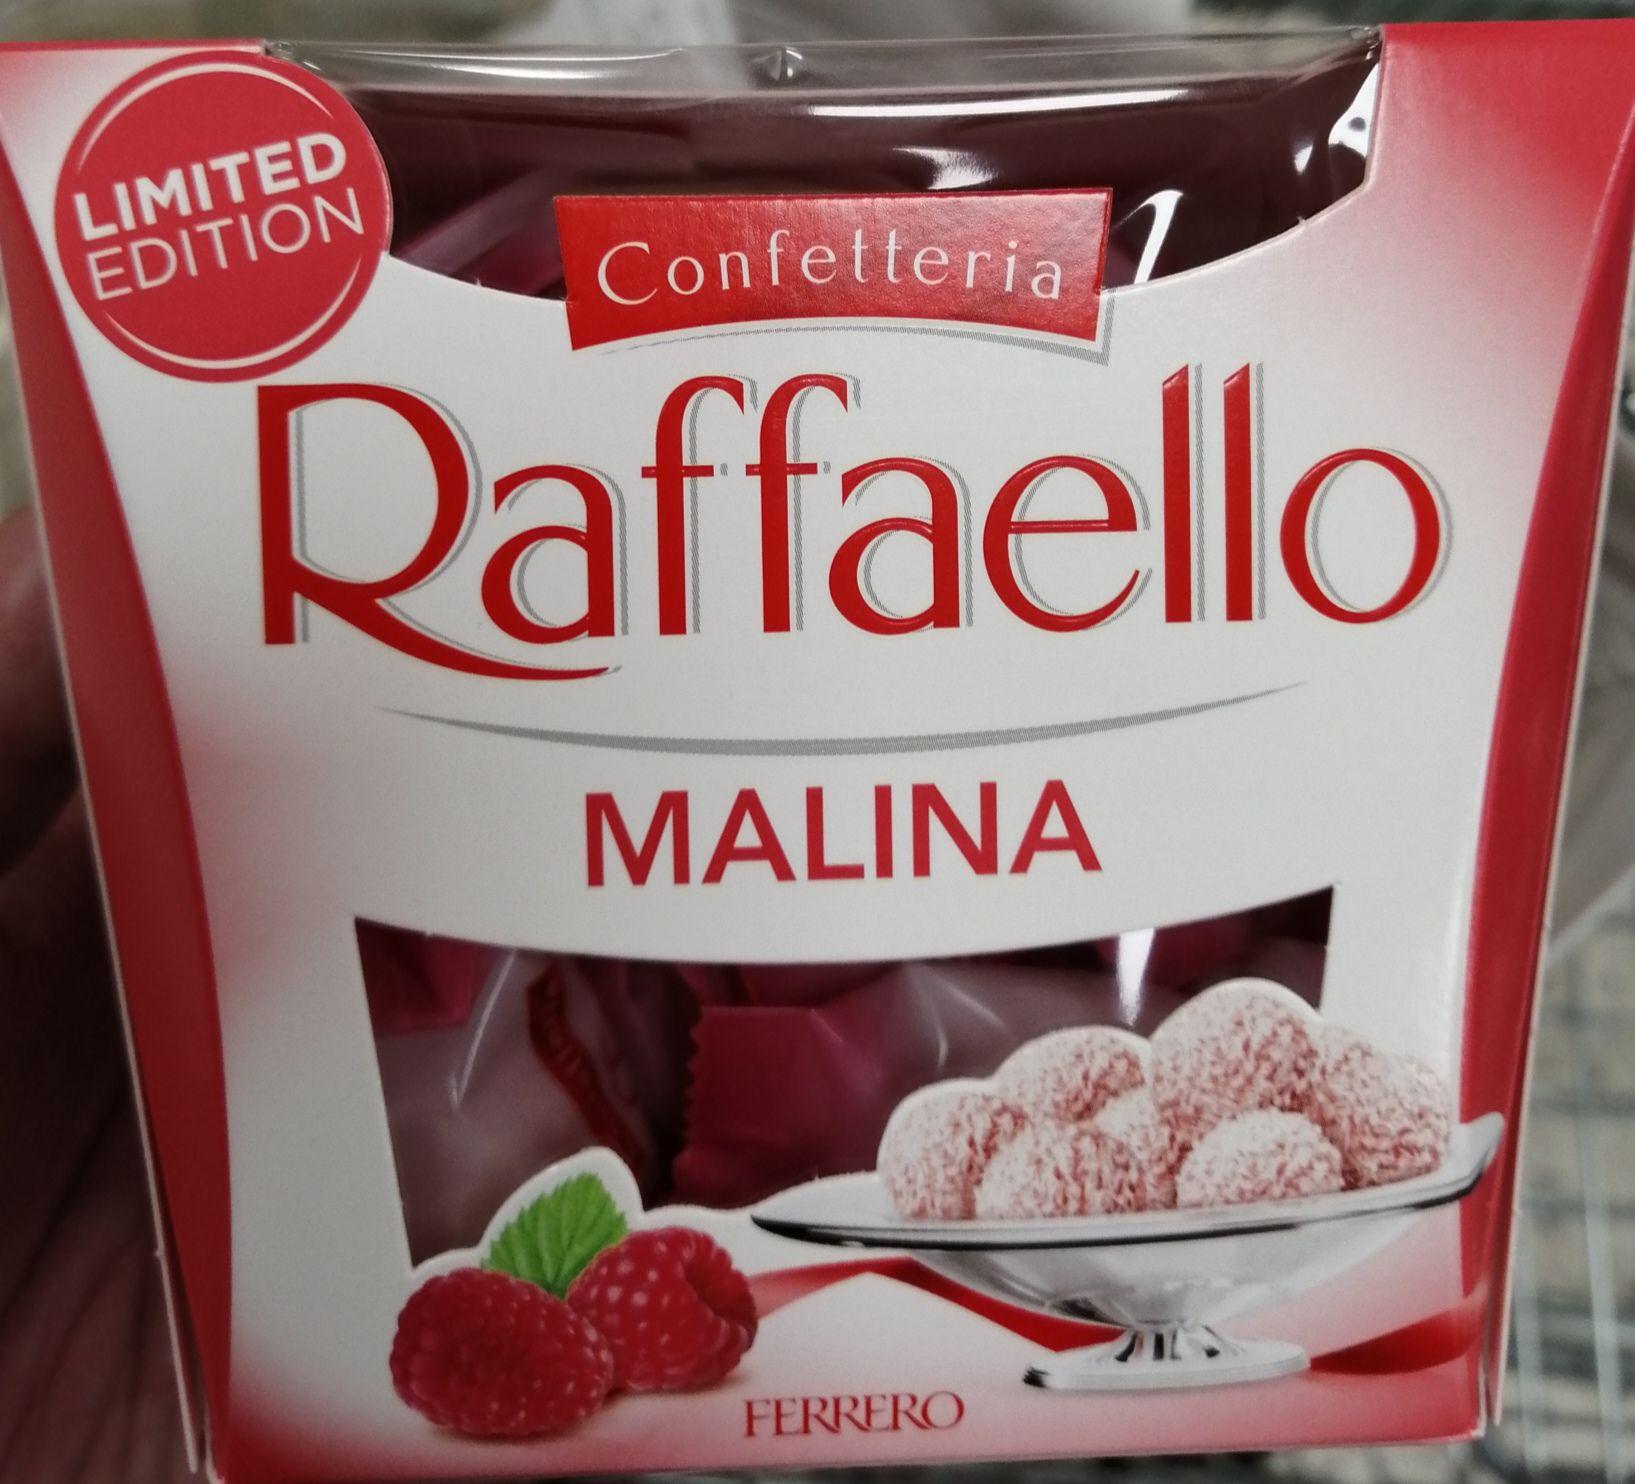 Raffaello Malina Limited Edition, Kaufland